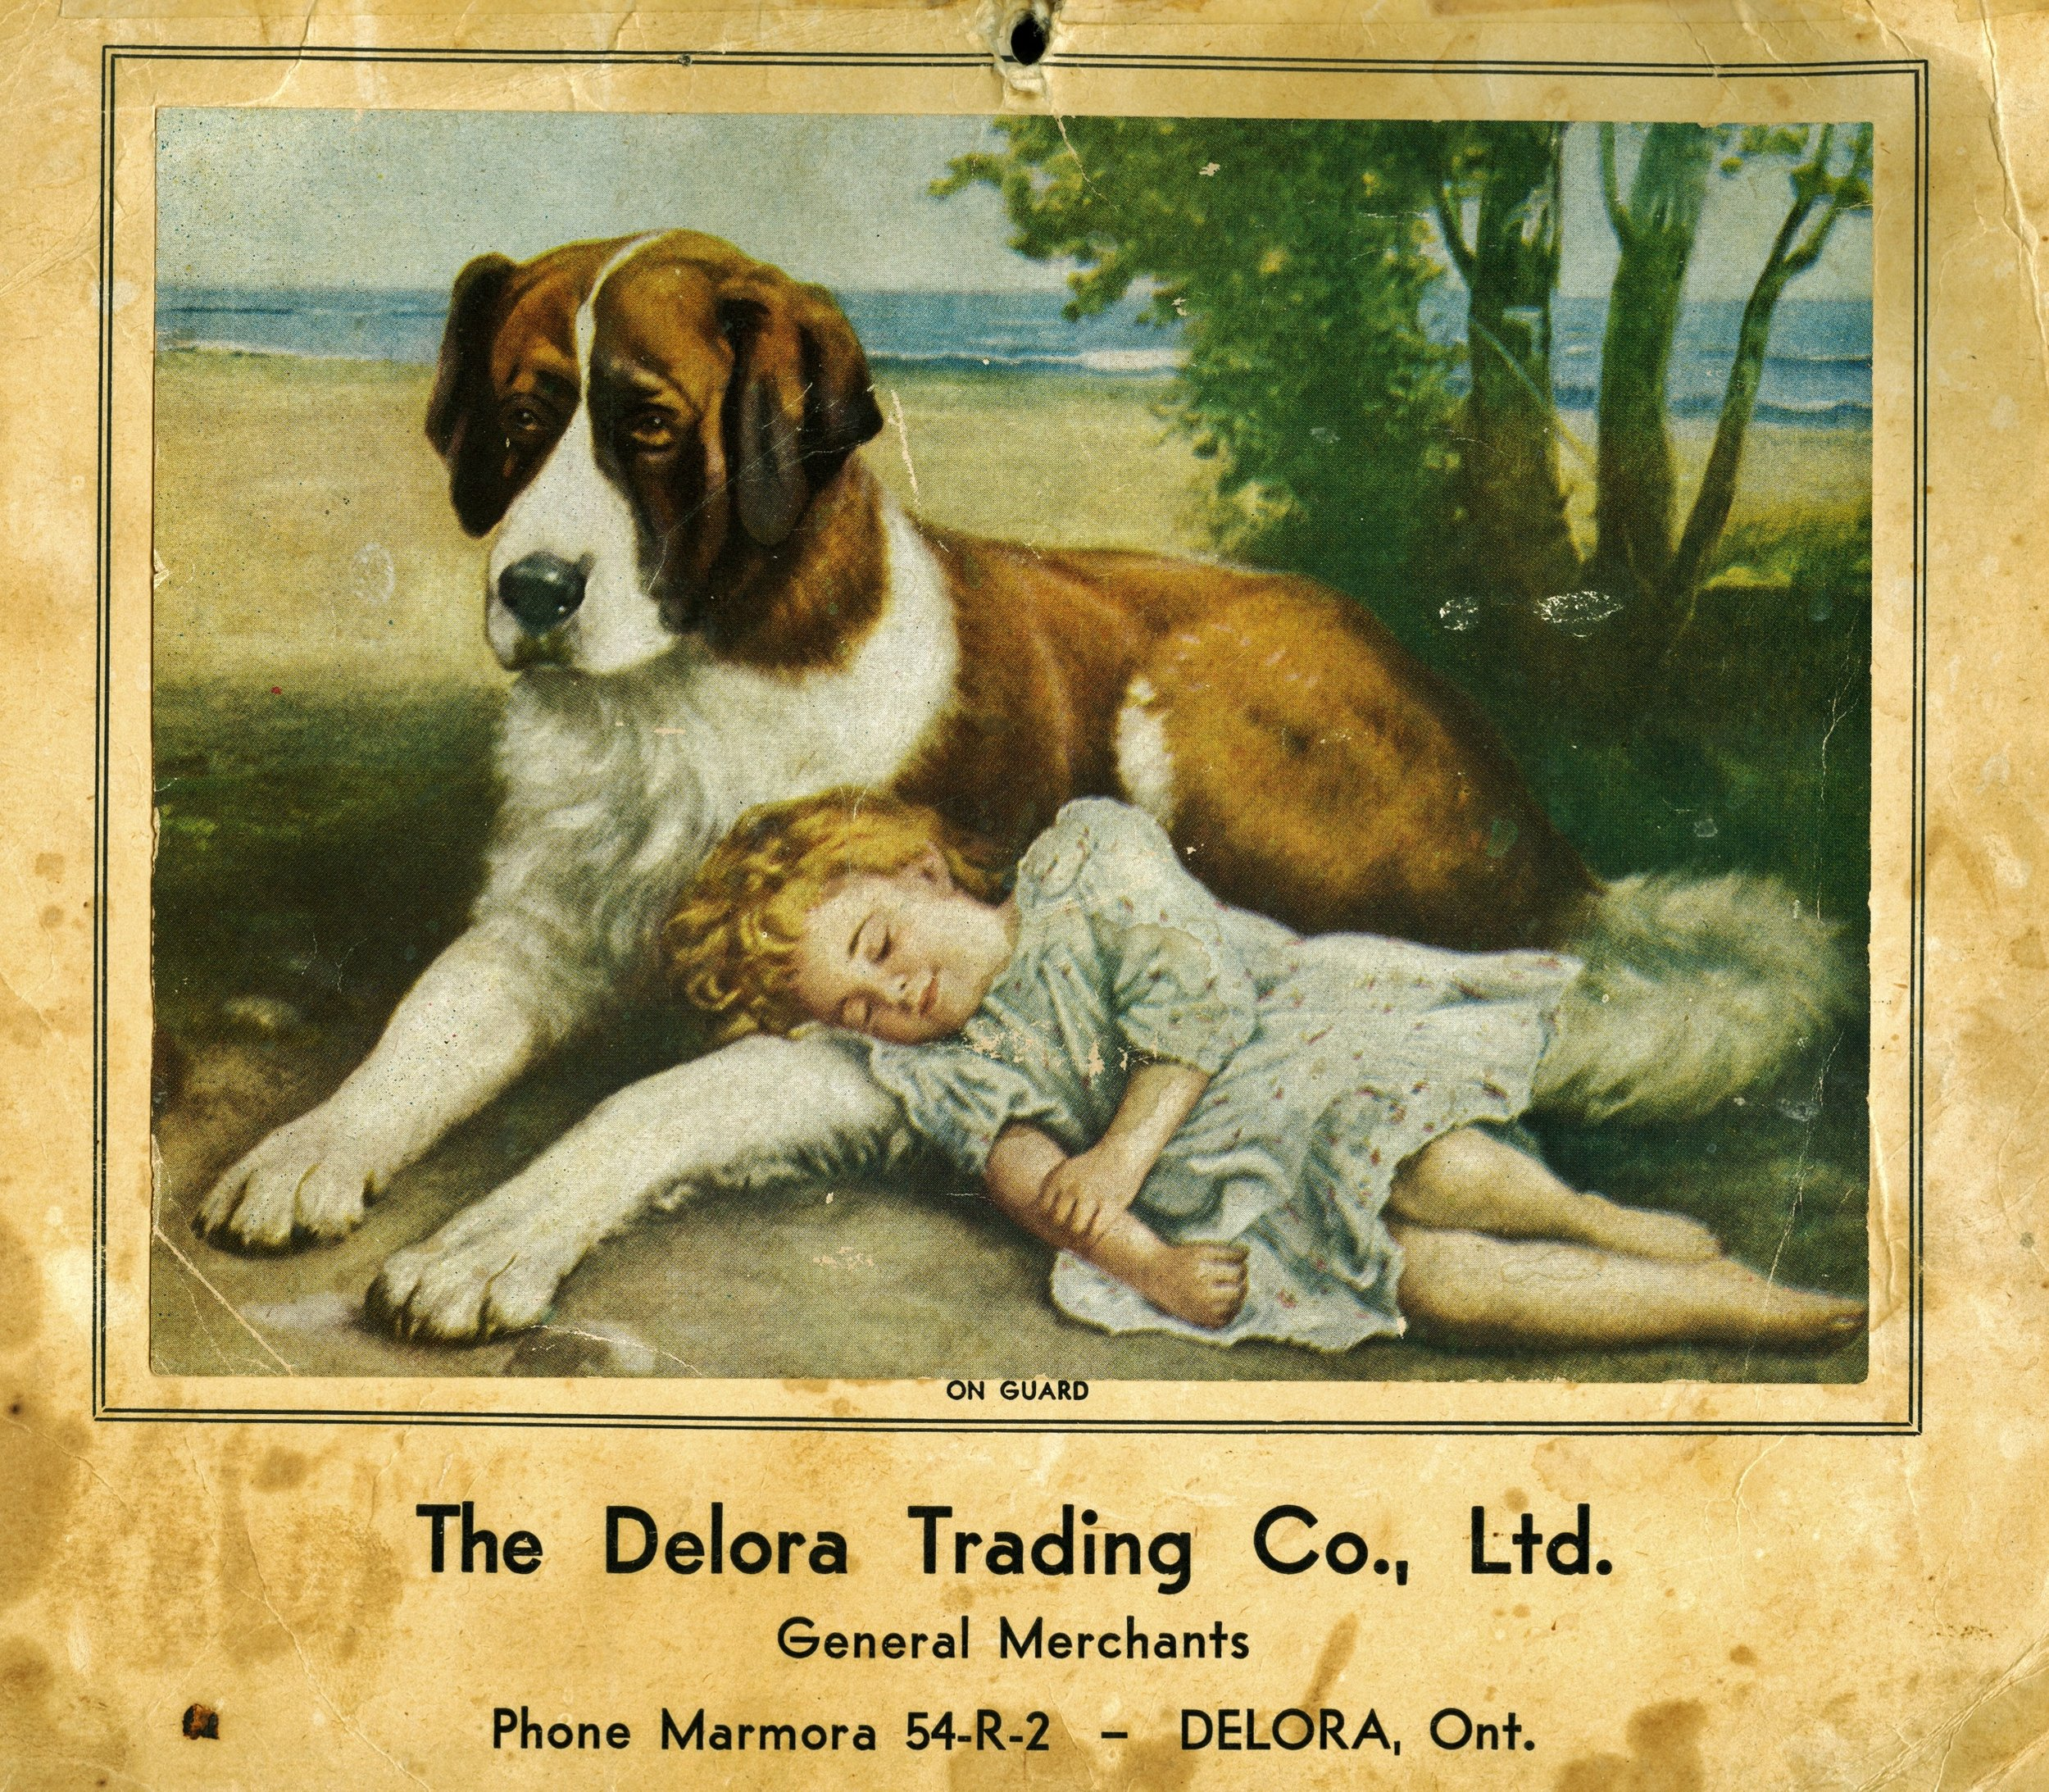 1952 Deloro Trading Co. Calender.jpg